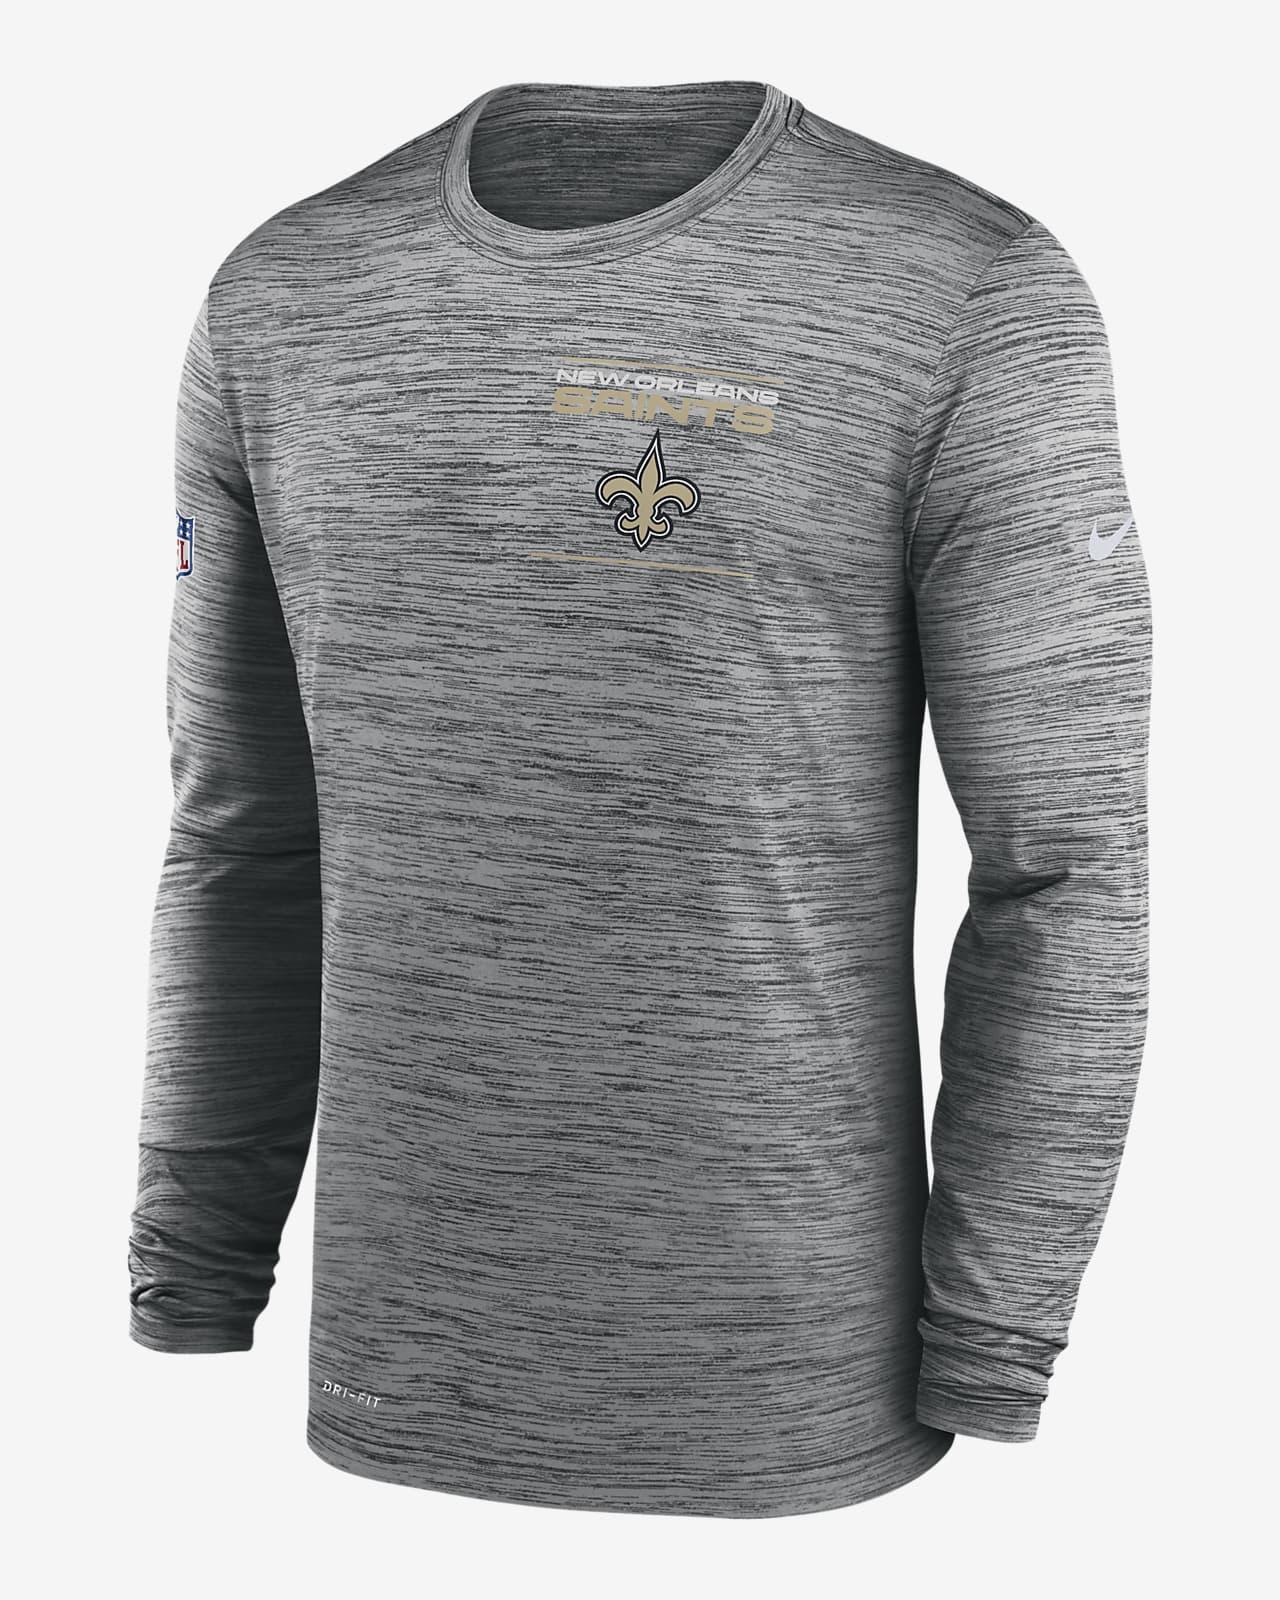 Nike Dri-FIT Sideline Velocity Legend (NFL New Orleans Saints) Men's Long-Sleeve T-Shirt